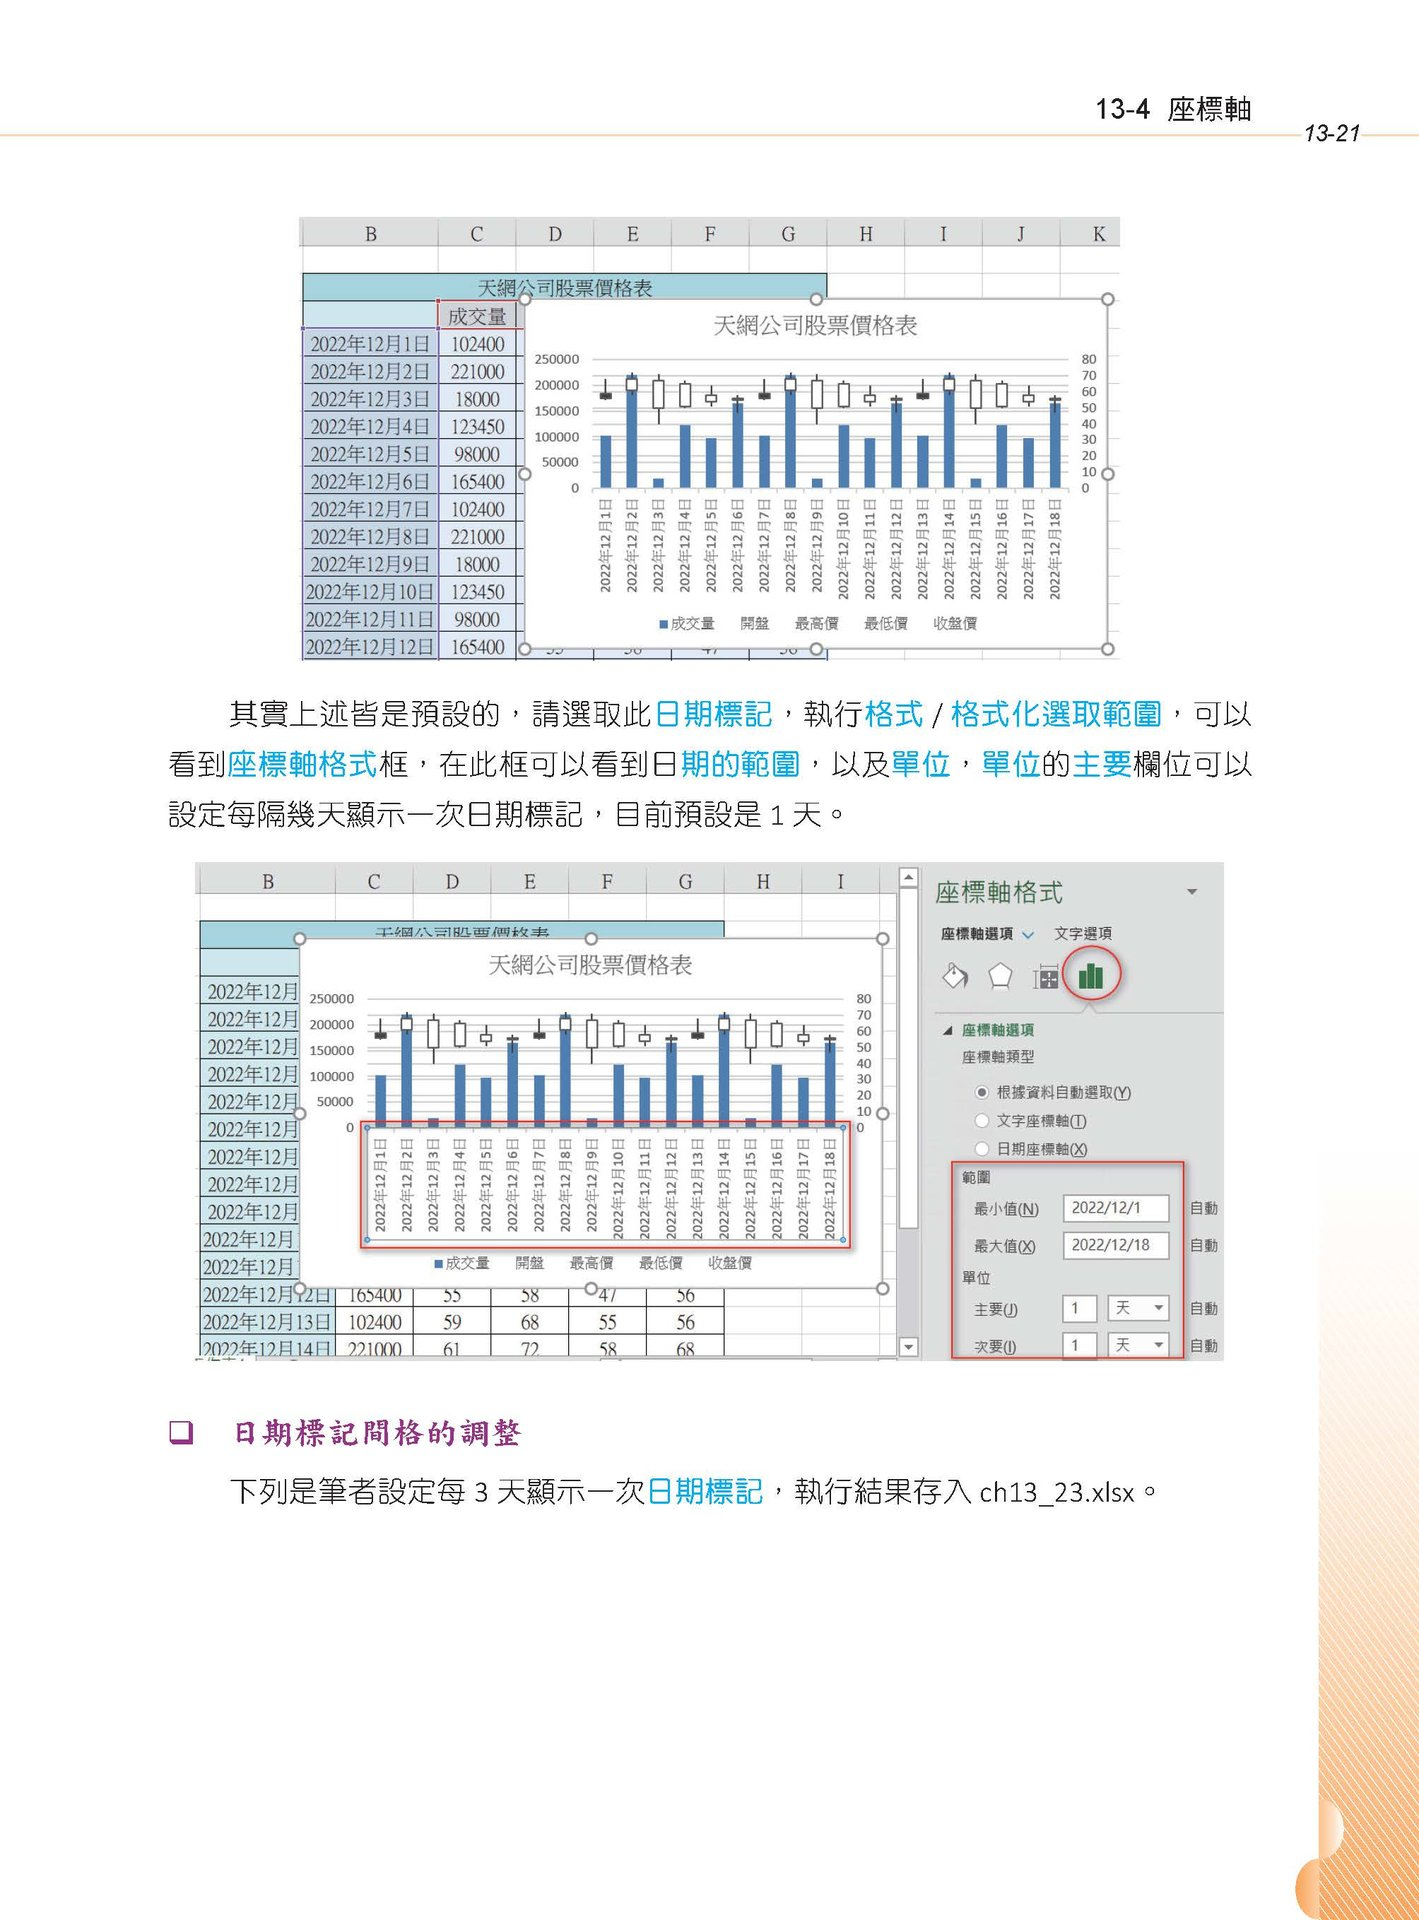 Excel 入門到完整學習 邁向最強職場應用—王者歸來 (全彩印刷)-preview-13